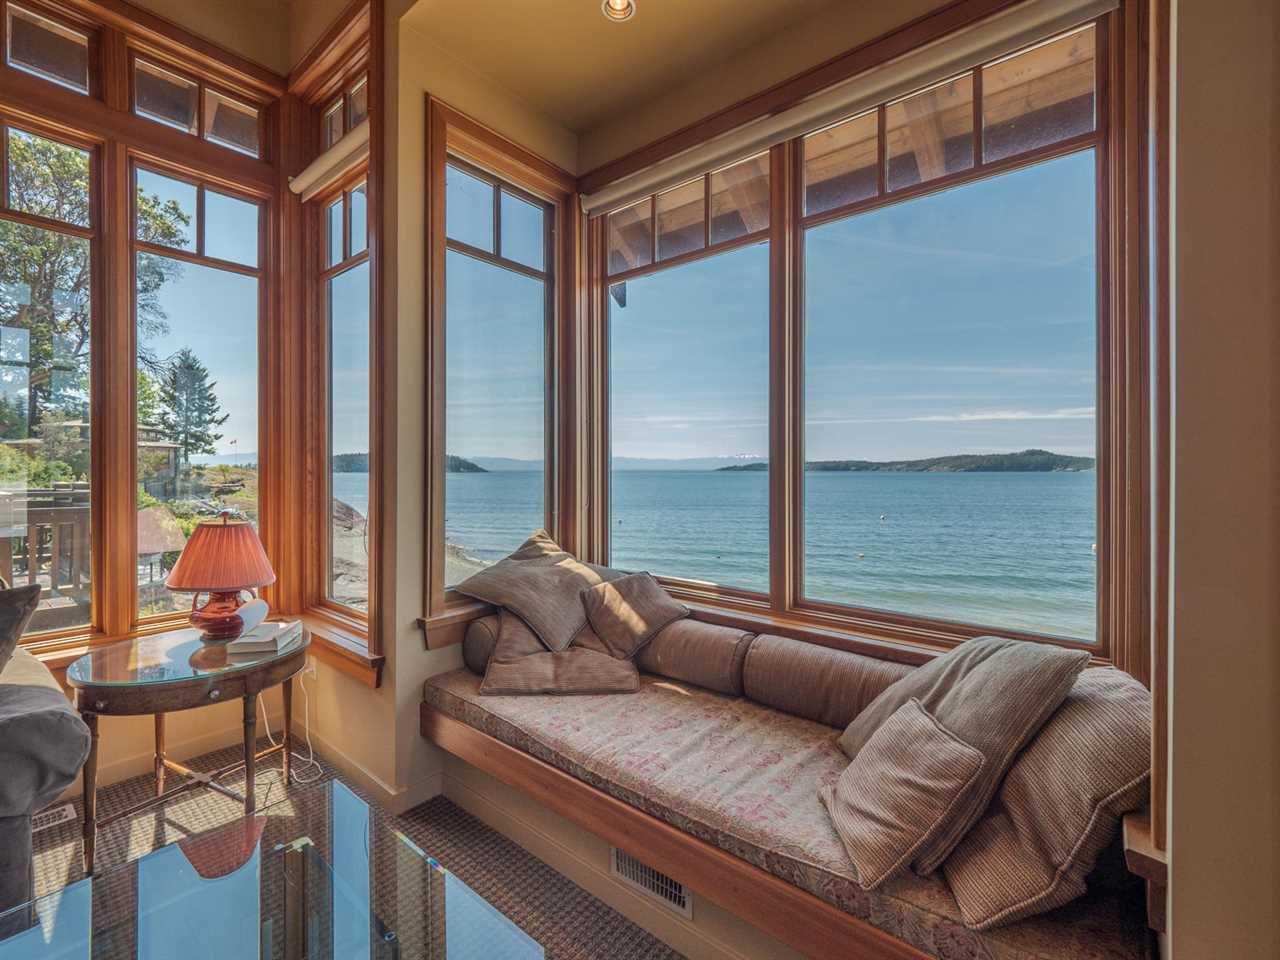 "Main Photo: 8423 8425 REDROOFFS Road in Halfmoon Bay: Halfmn Bay Secret Cv Redroofs House for sale in ""HALFMOON BAY WATERFRONT"" (Sunshine Coast)  : MLS®# R2363344"